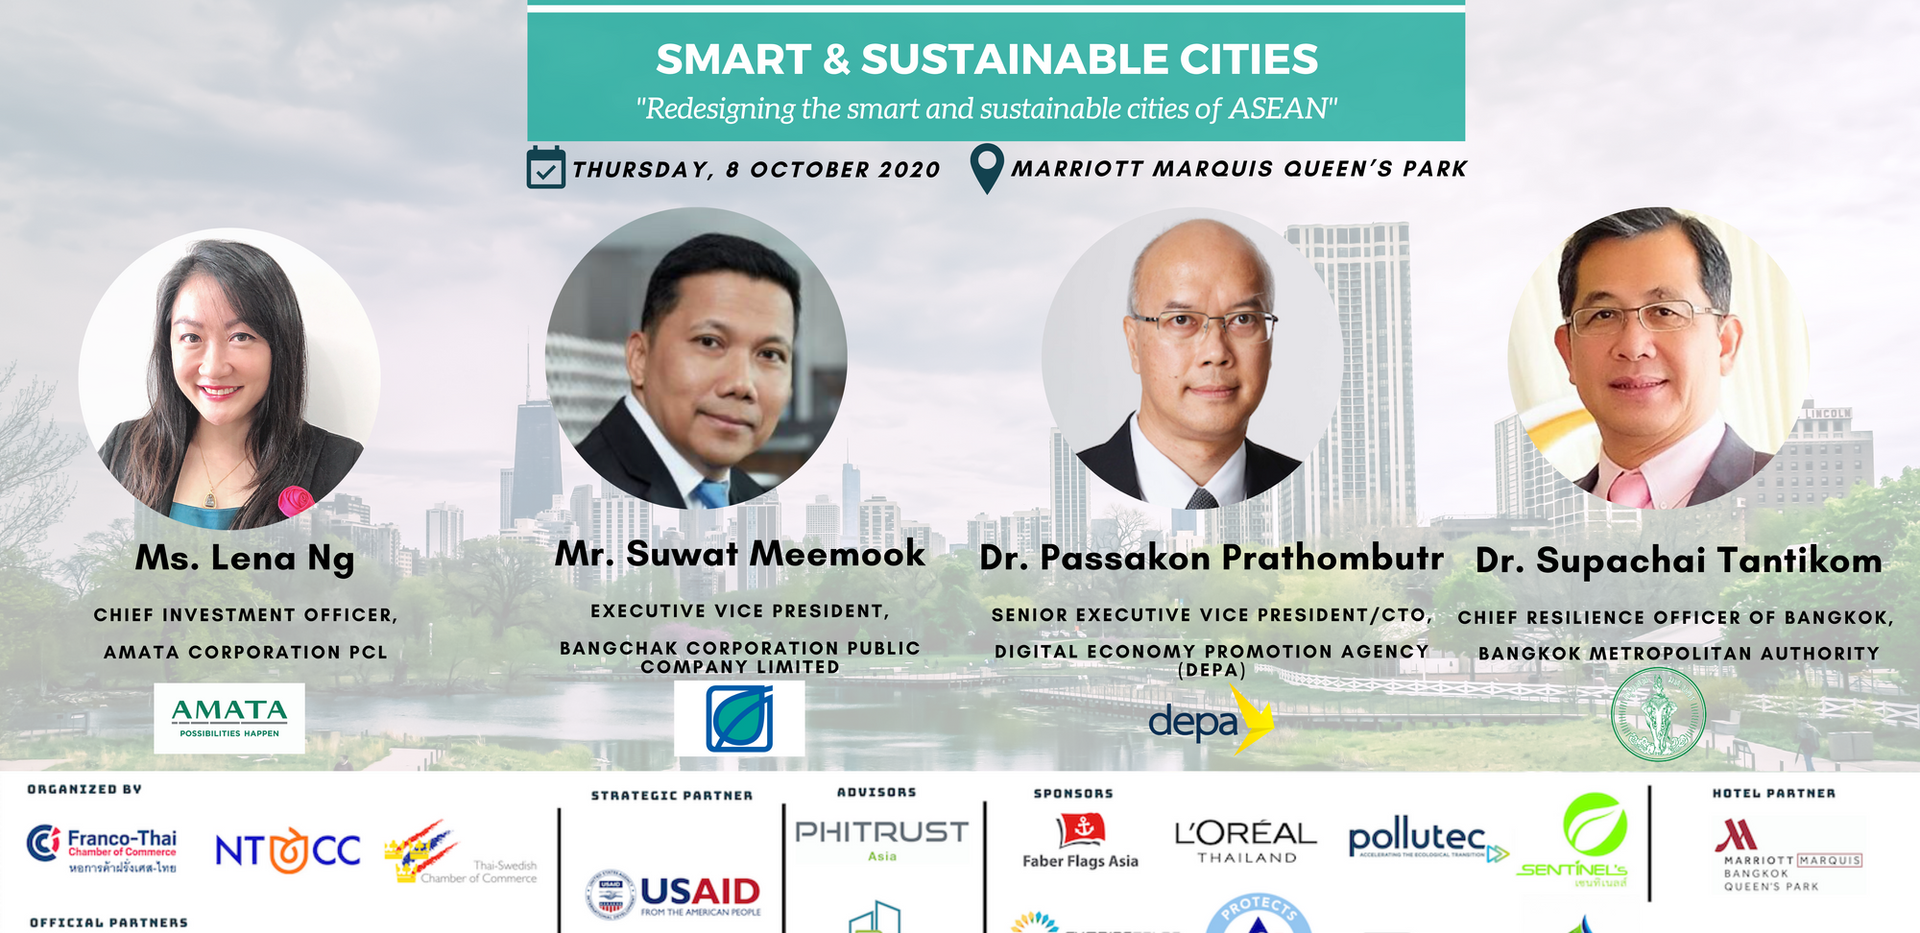 Redesigning cities in ASEAN